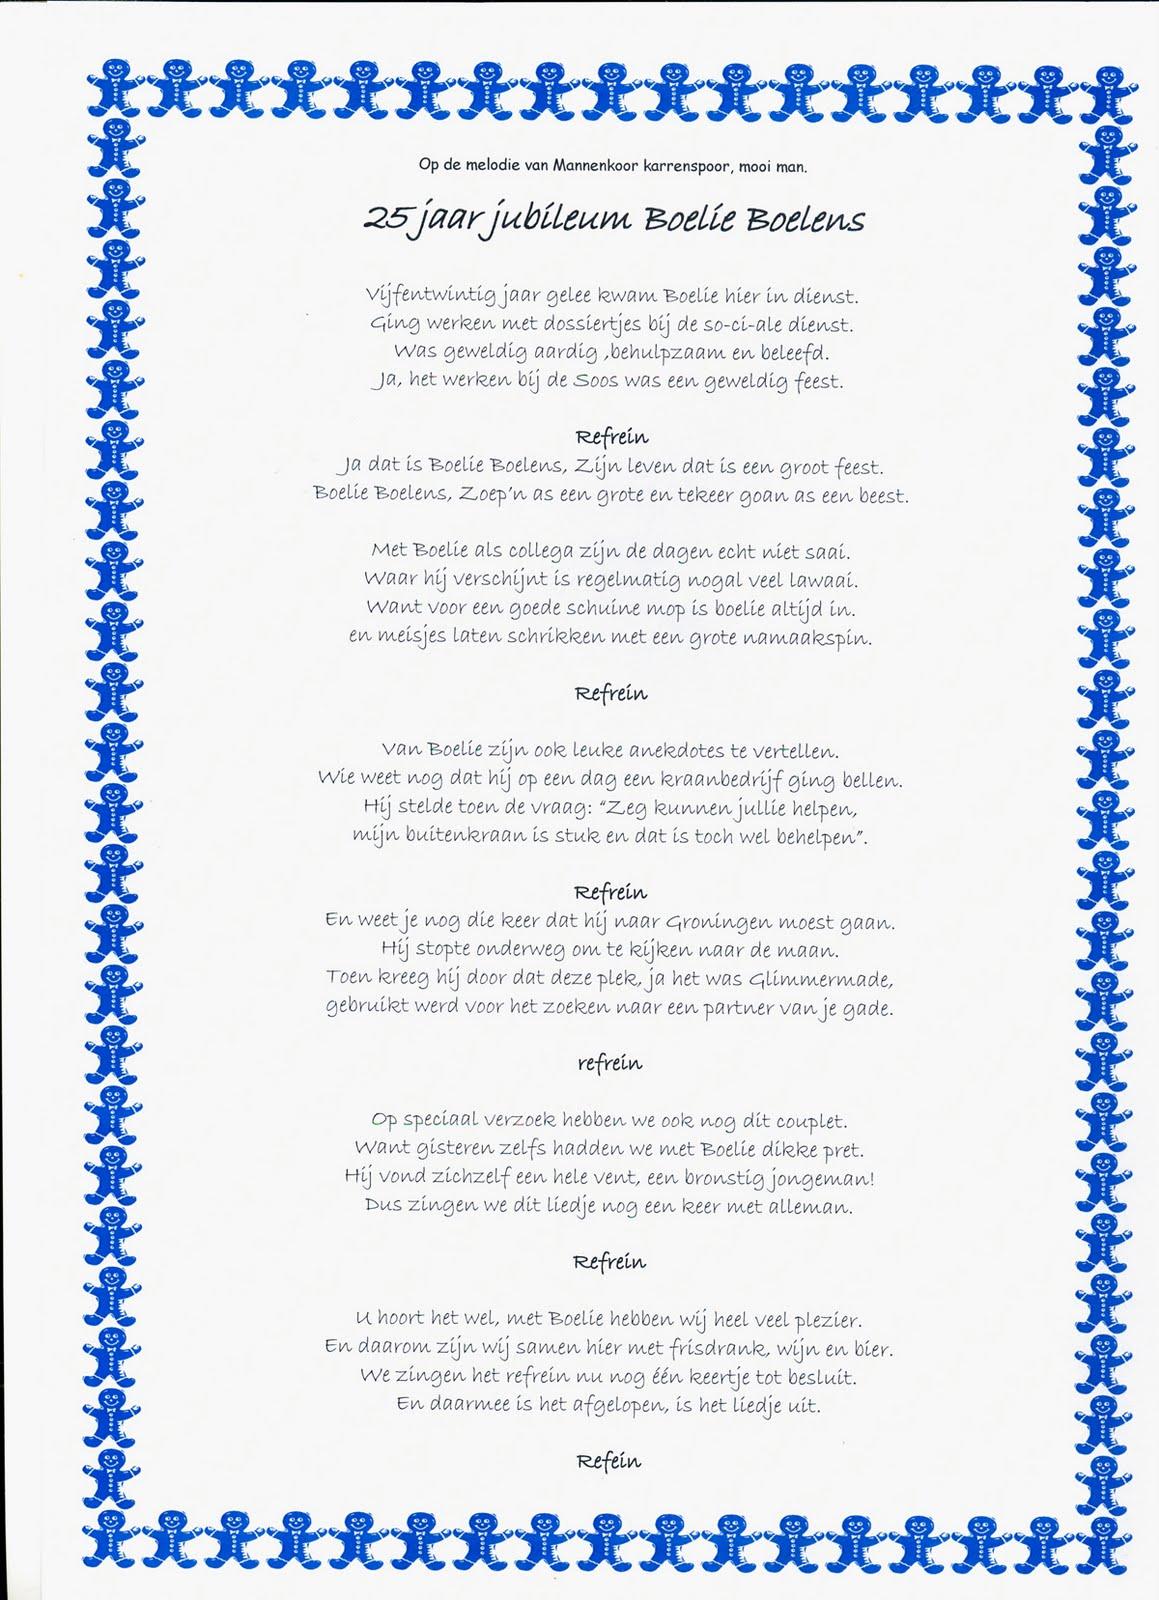 tekst 25 jaar in dienst Gedicht 25 Jaar In Dienst Humor #ZG52 – Aboriginaltourismontario tekst 25 jaar in dienst